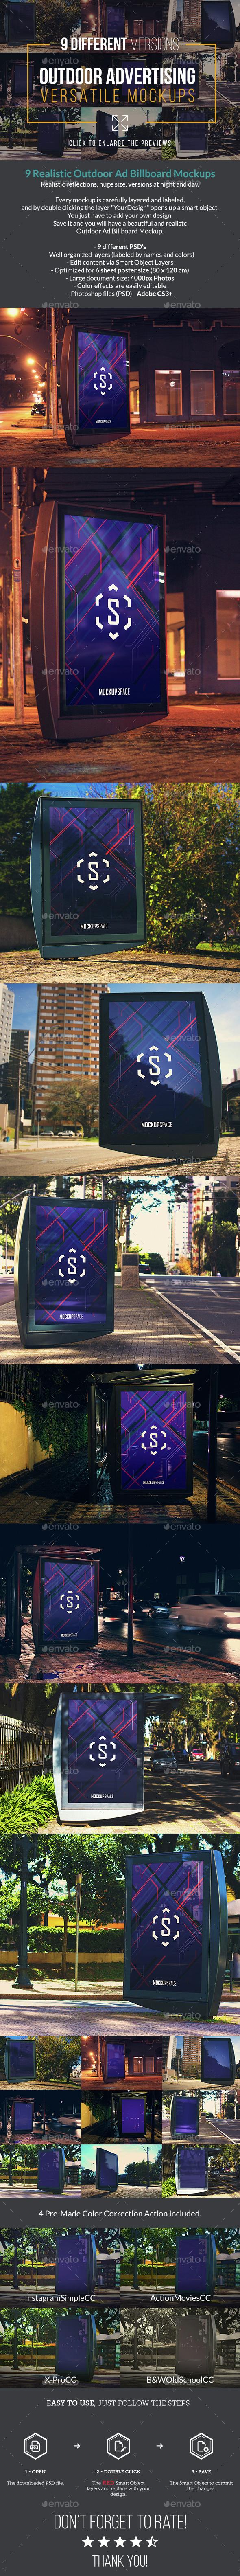 Outdoor Ad Billboard - 9 Mock-up - Signage Print